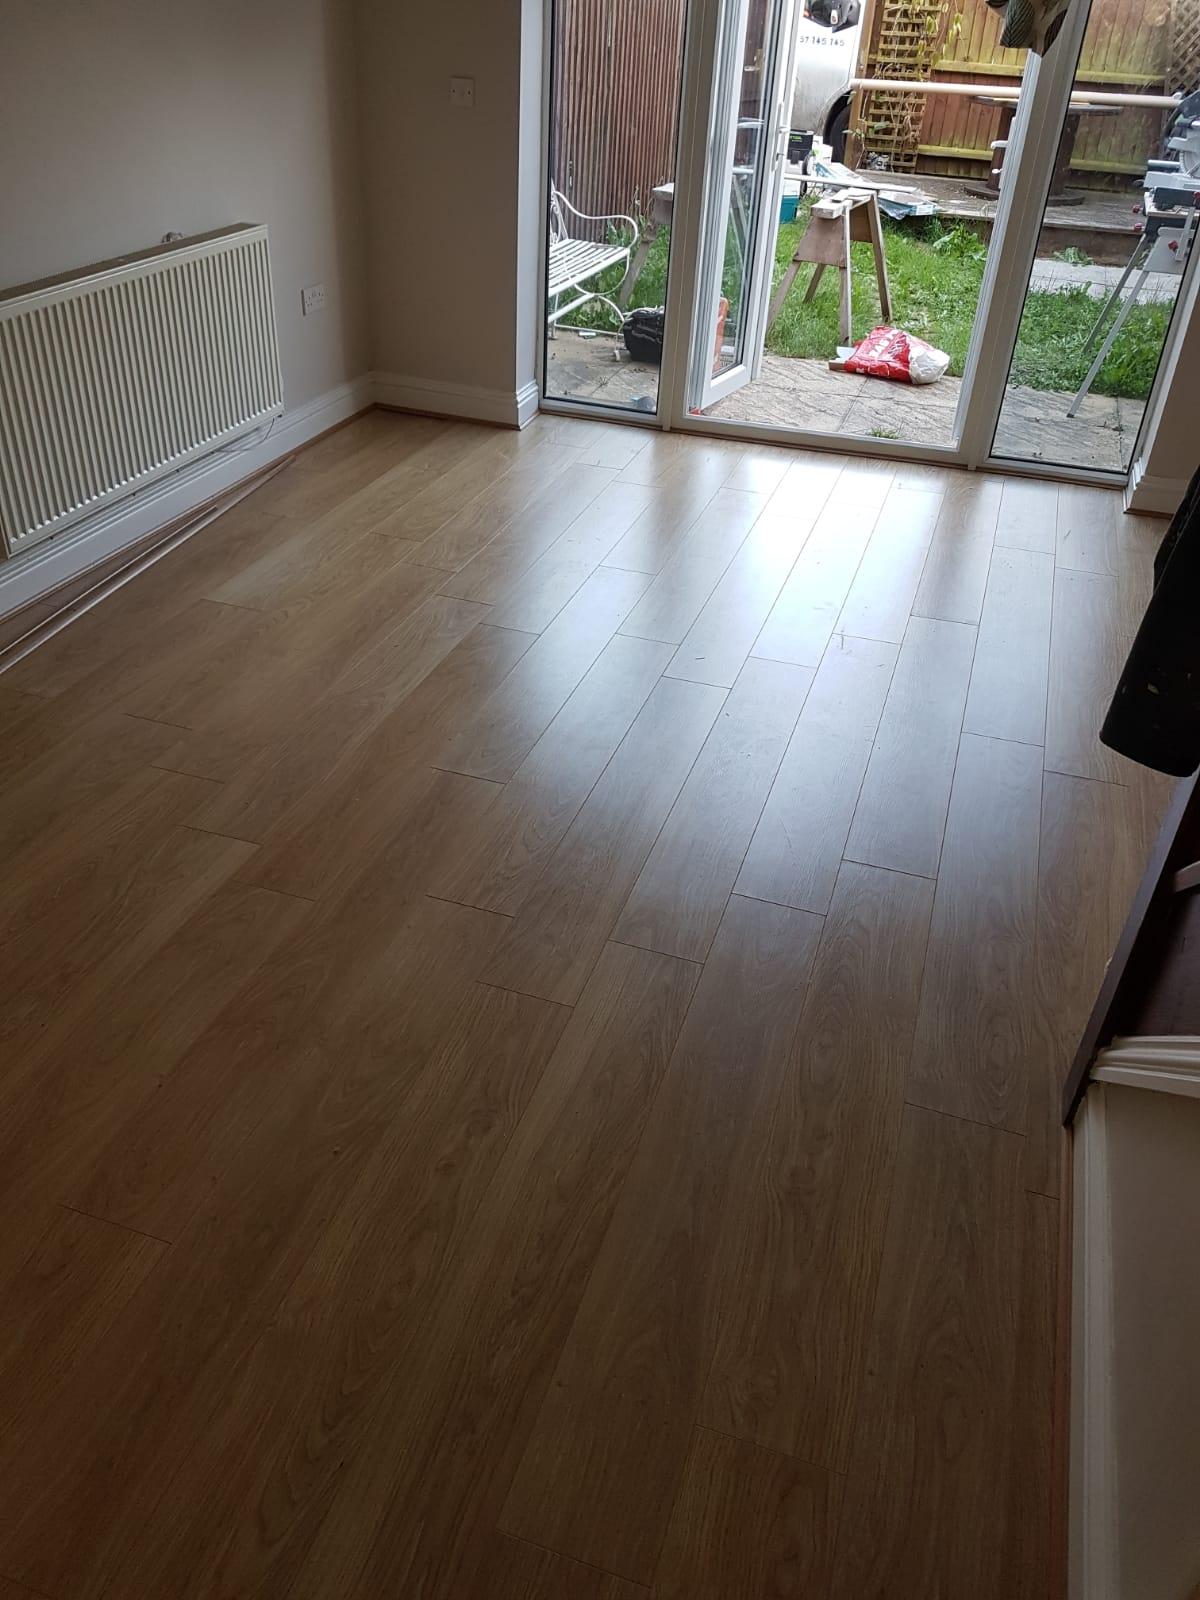 A timber flooring we lay in Lakenheath